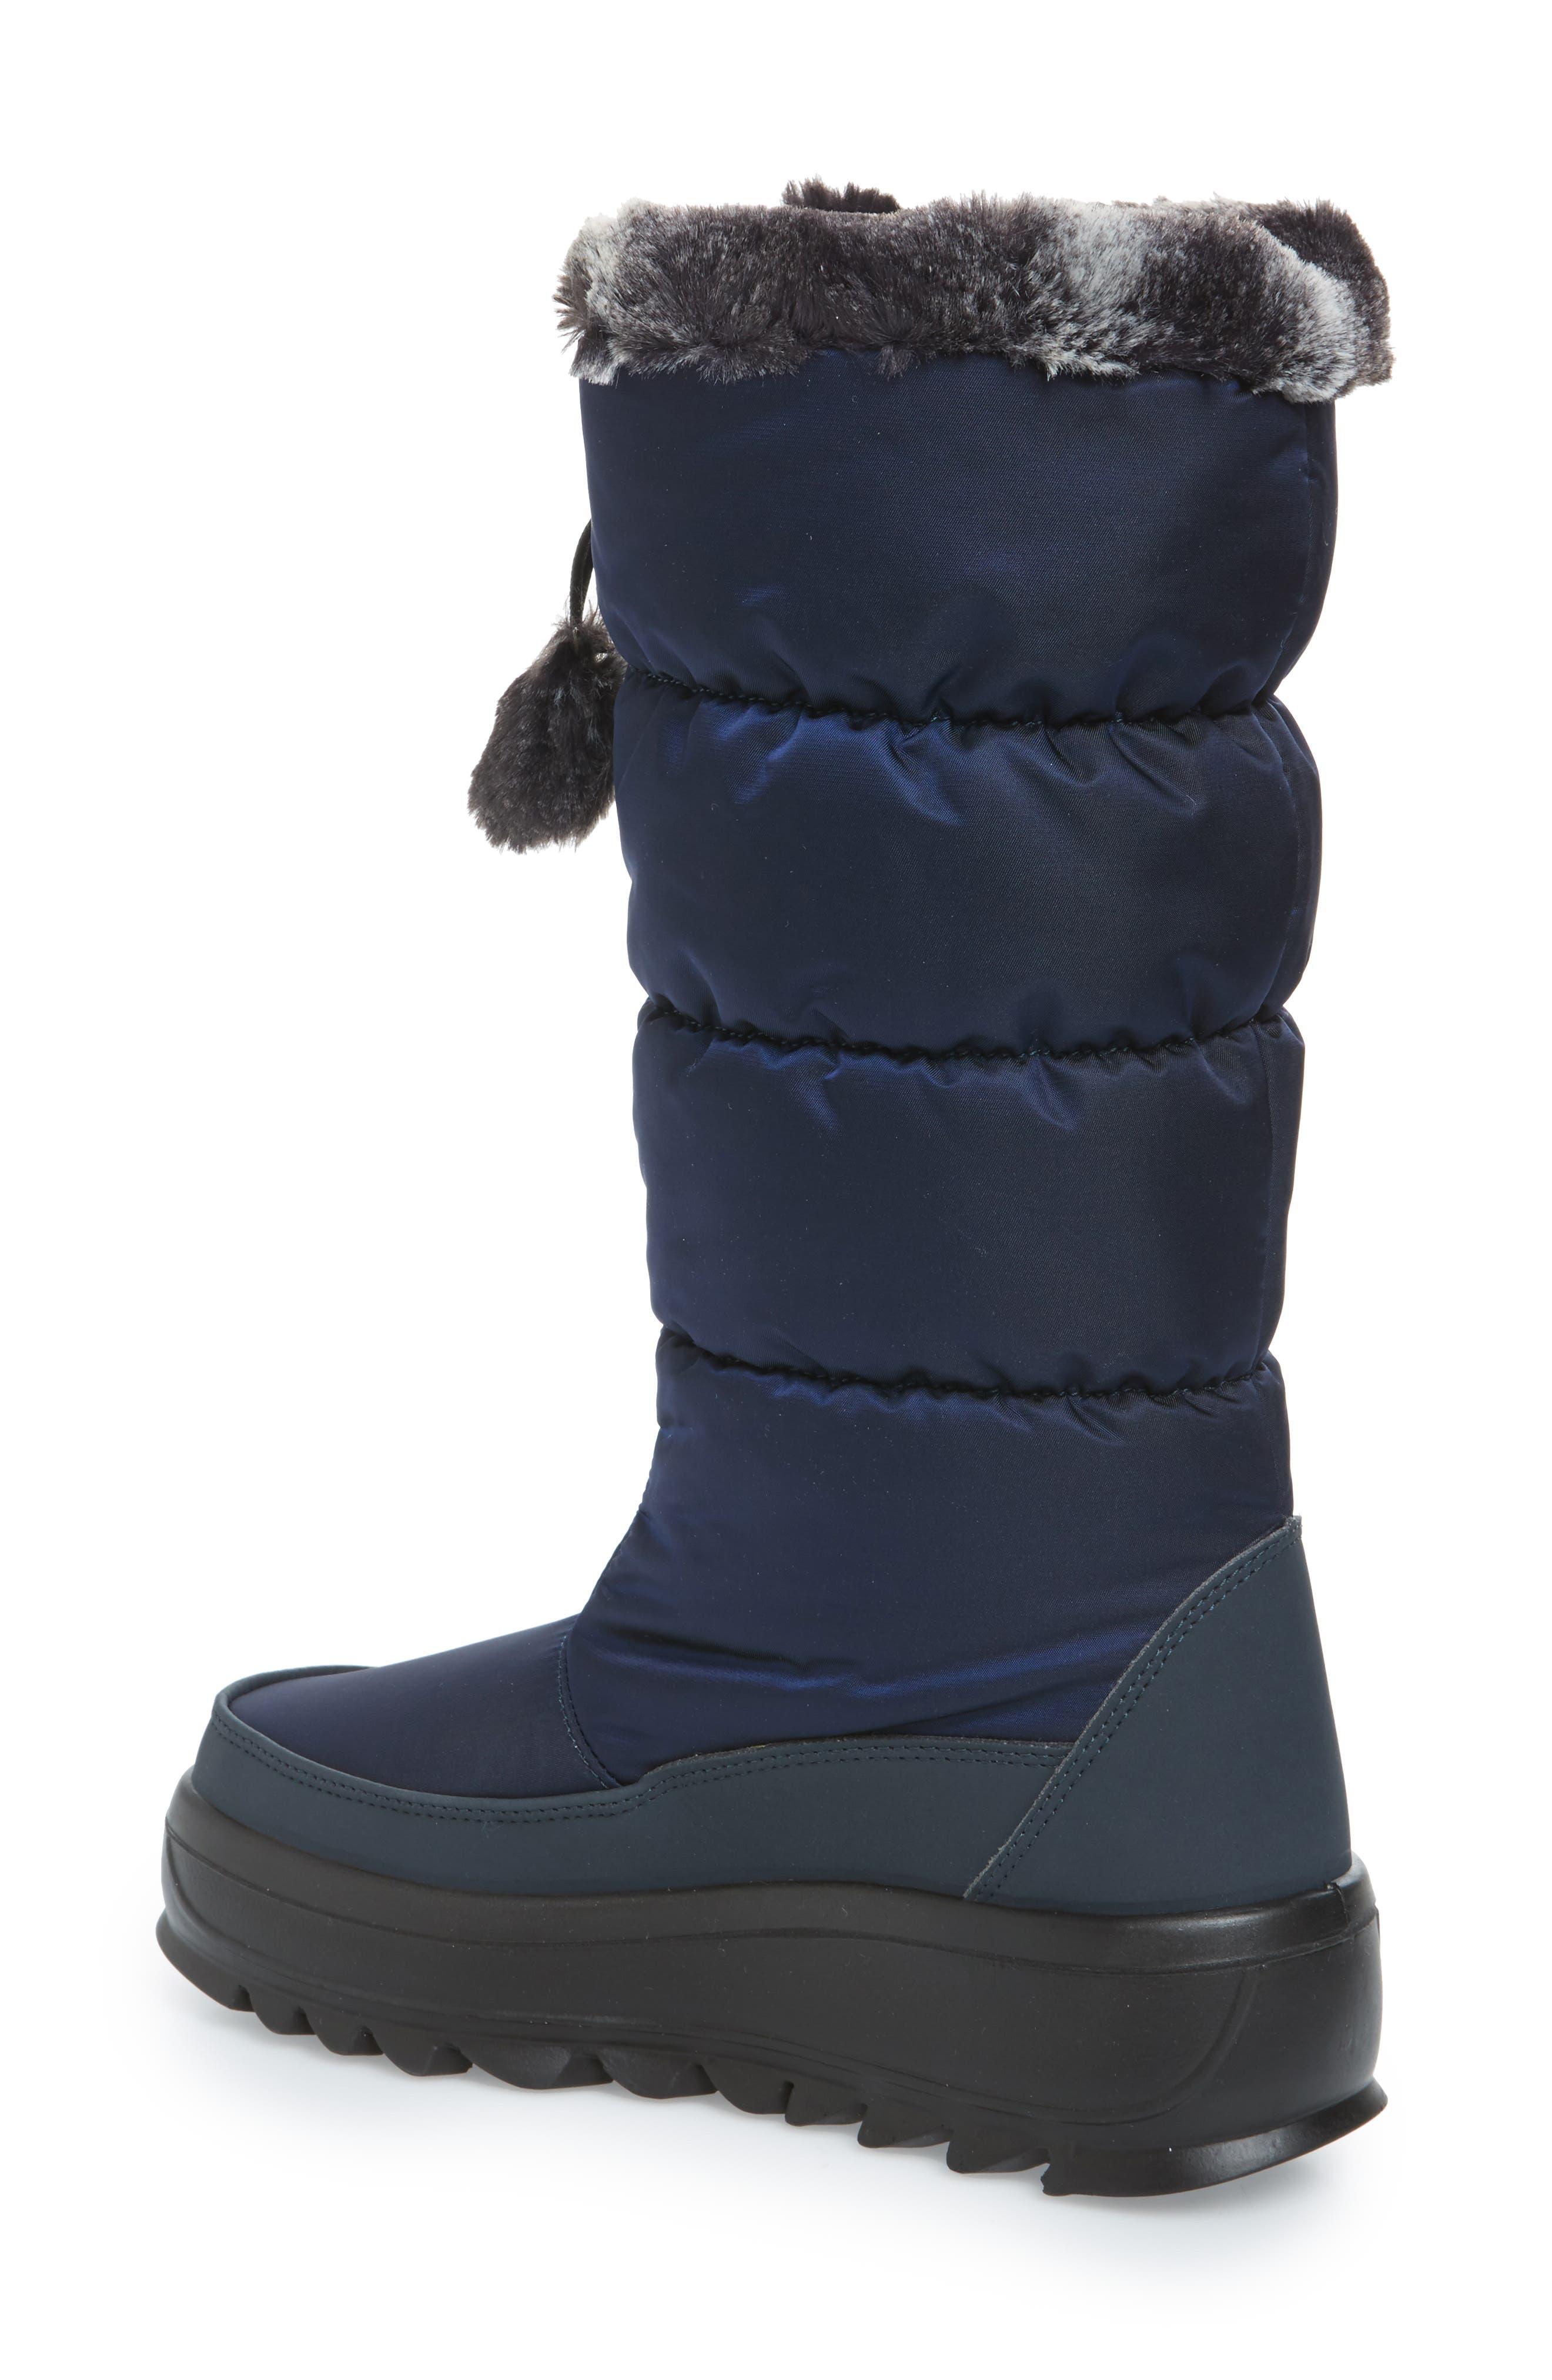 Toboggan 2 Faux Fur Trim Insulated Waterproof Boot,                             Alternate thumbnail 2, color,                             NAVY FABRIC